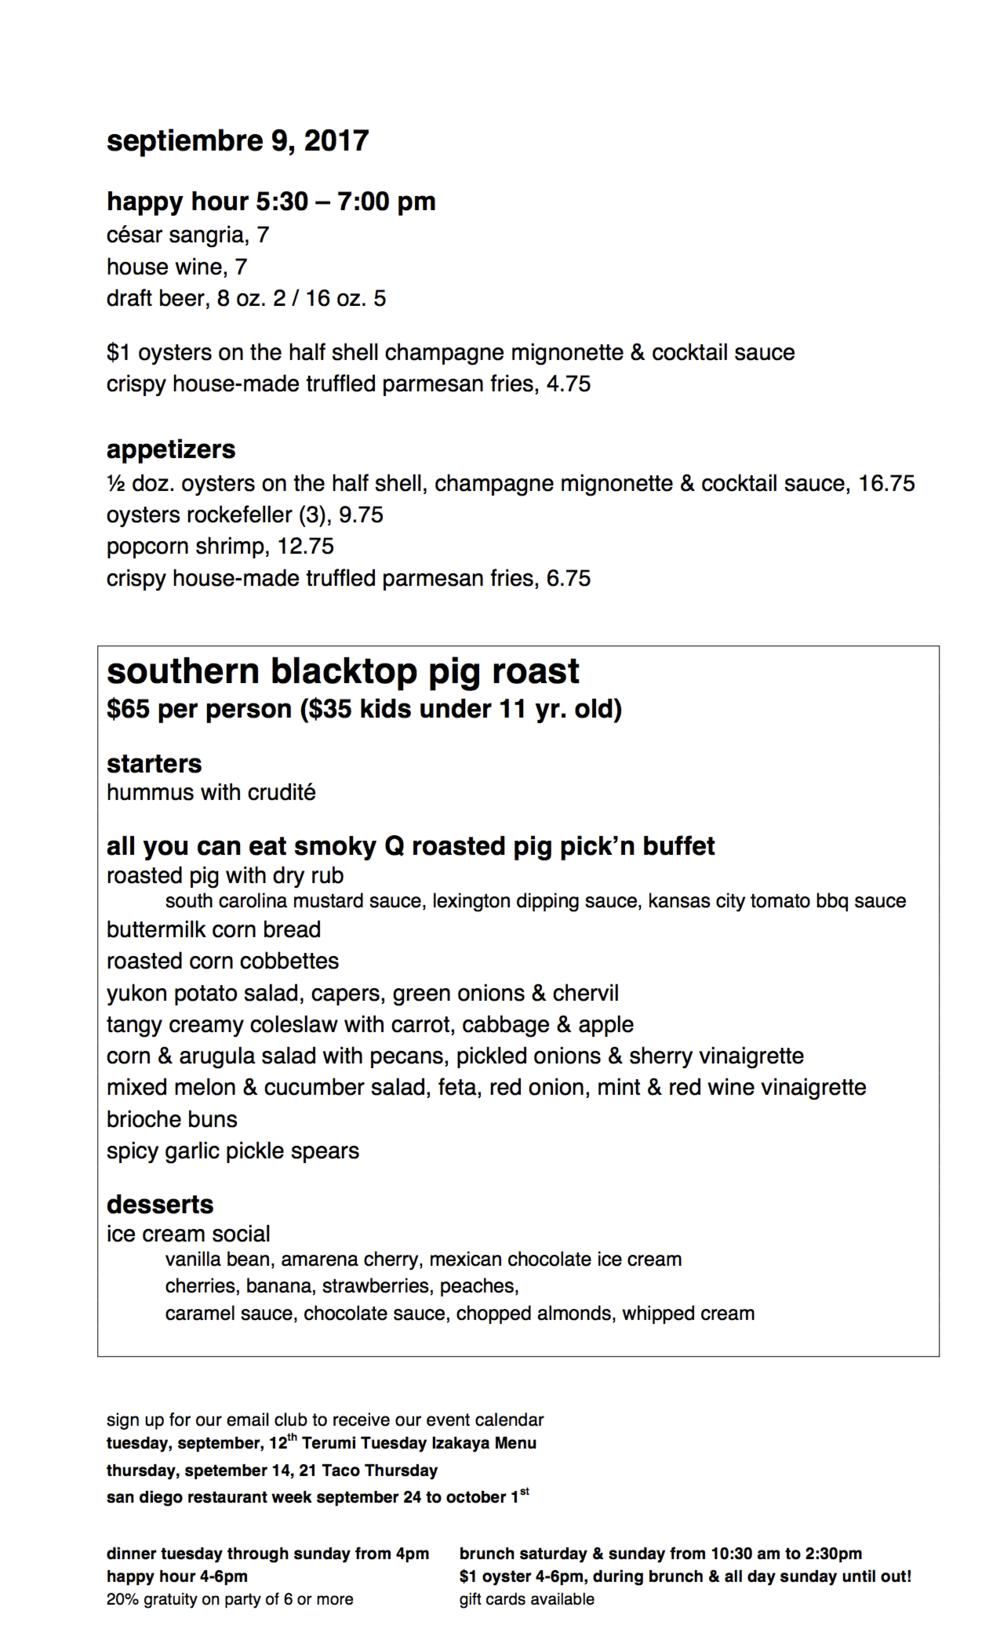 090917 pig roast menu v.1 (1).png